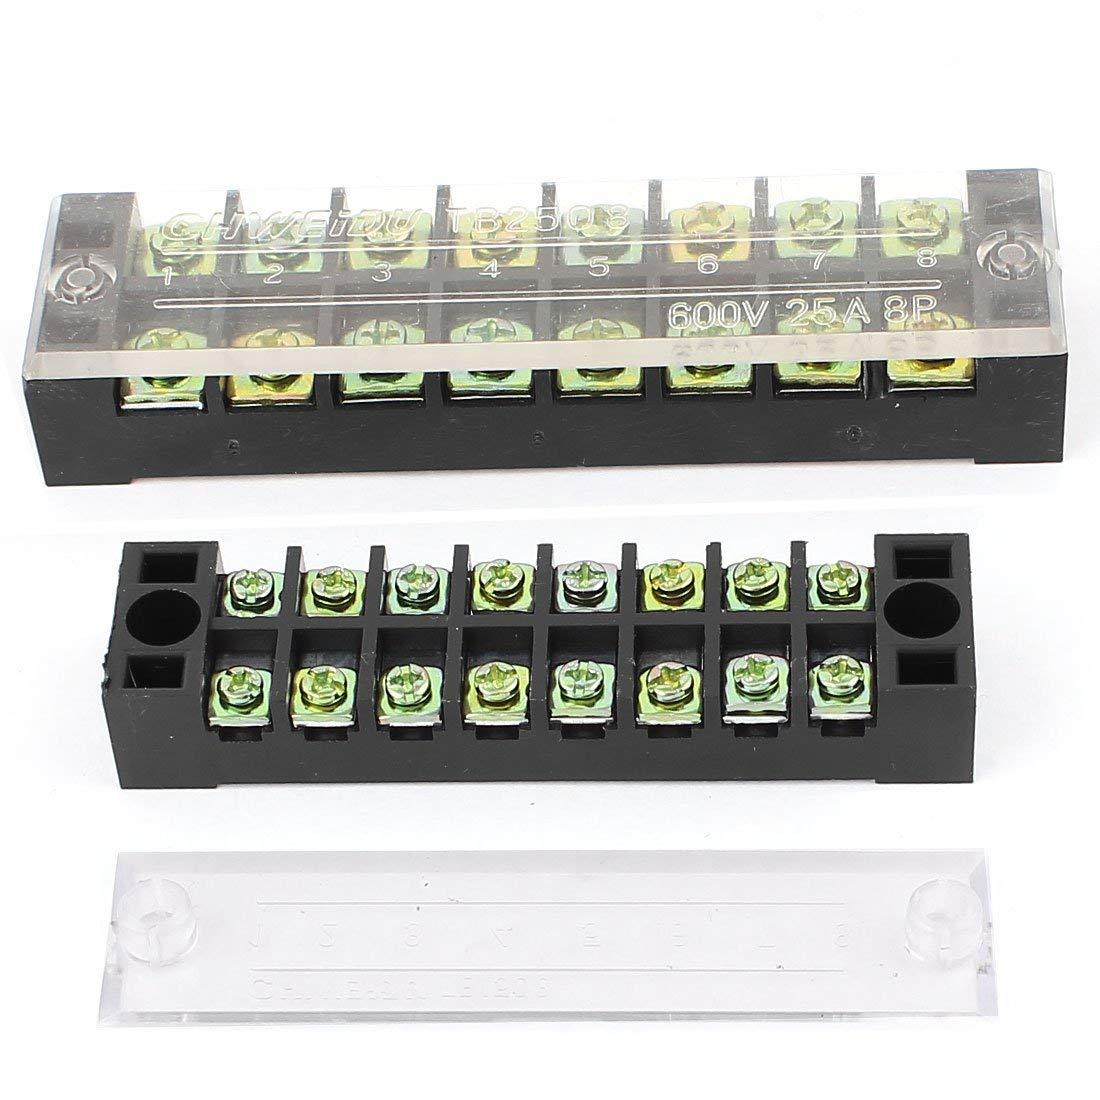 Aexit 2Pcs 600V 15A/25A Dual Row 8 Position Barrier Terminal Strip Block Set